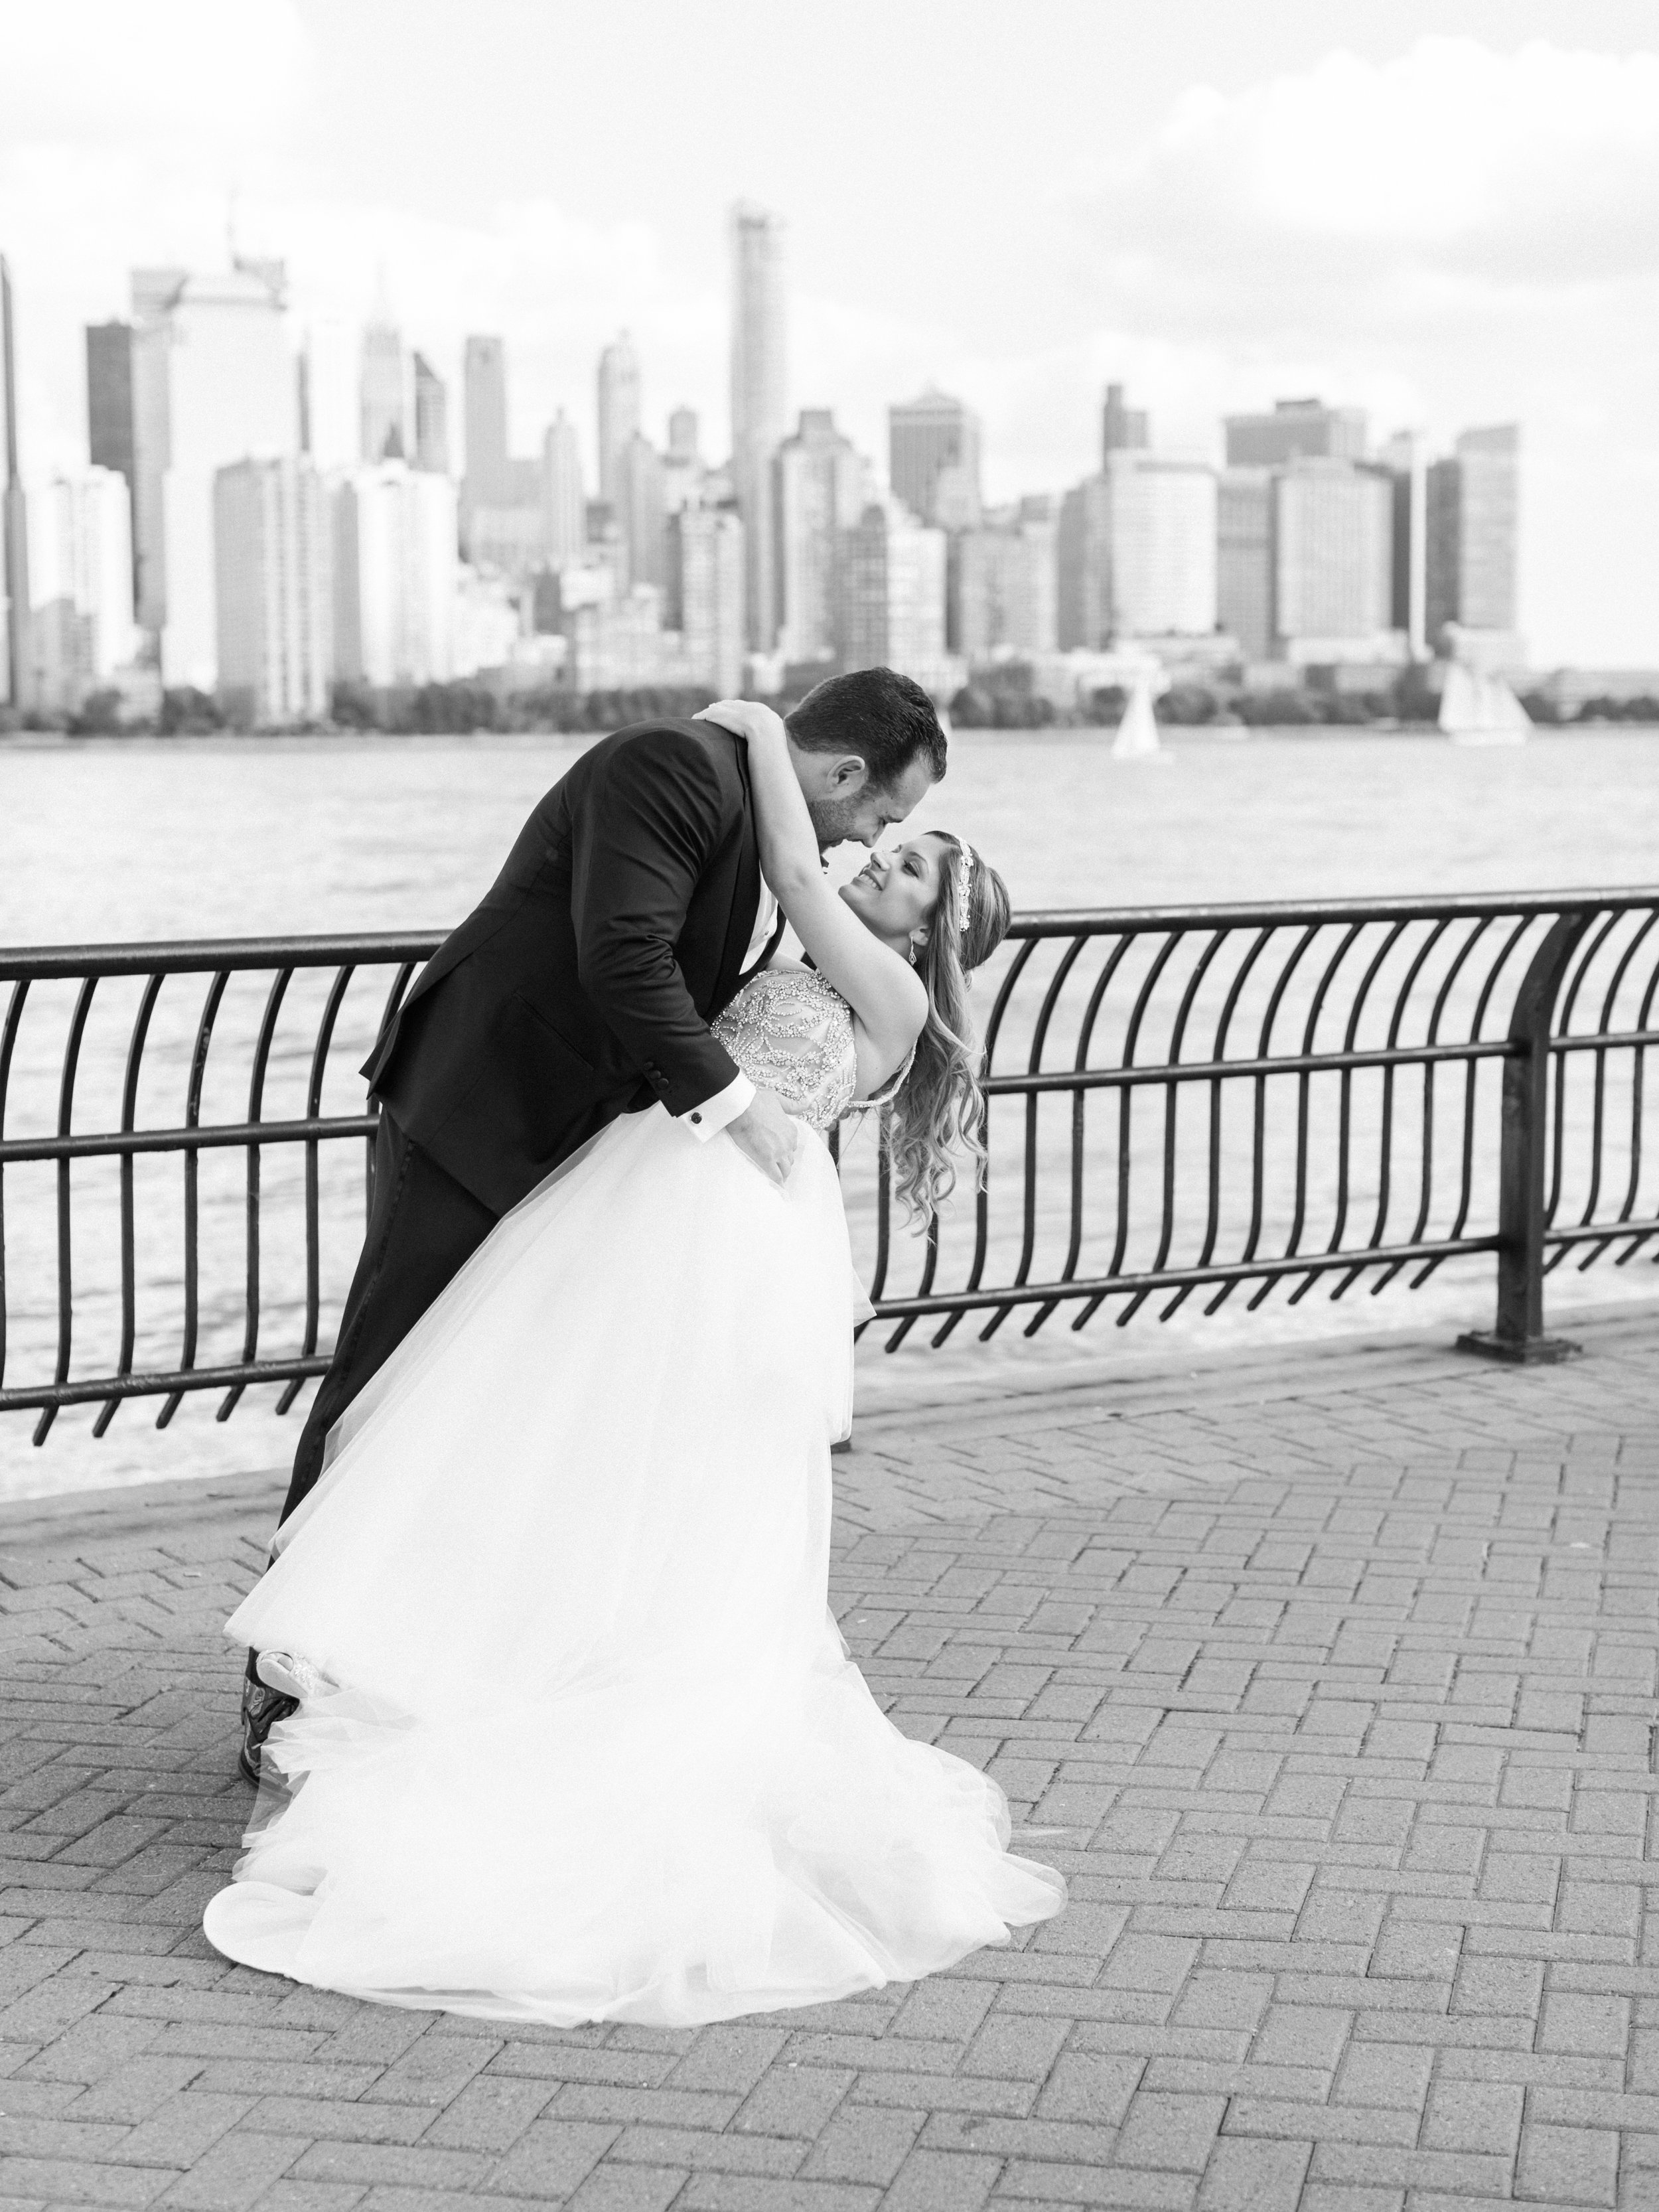 hyatt-regency-jersey-city-wedding-photographer35.jpg